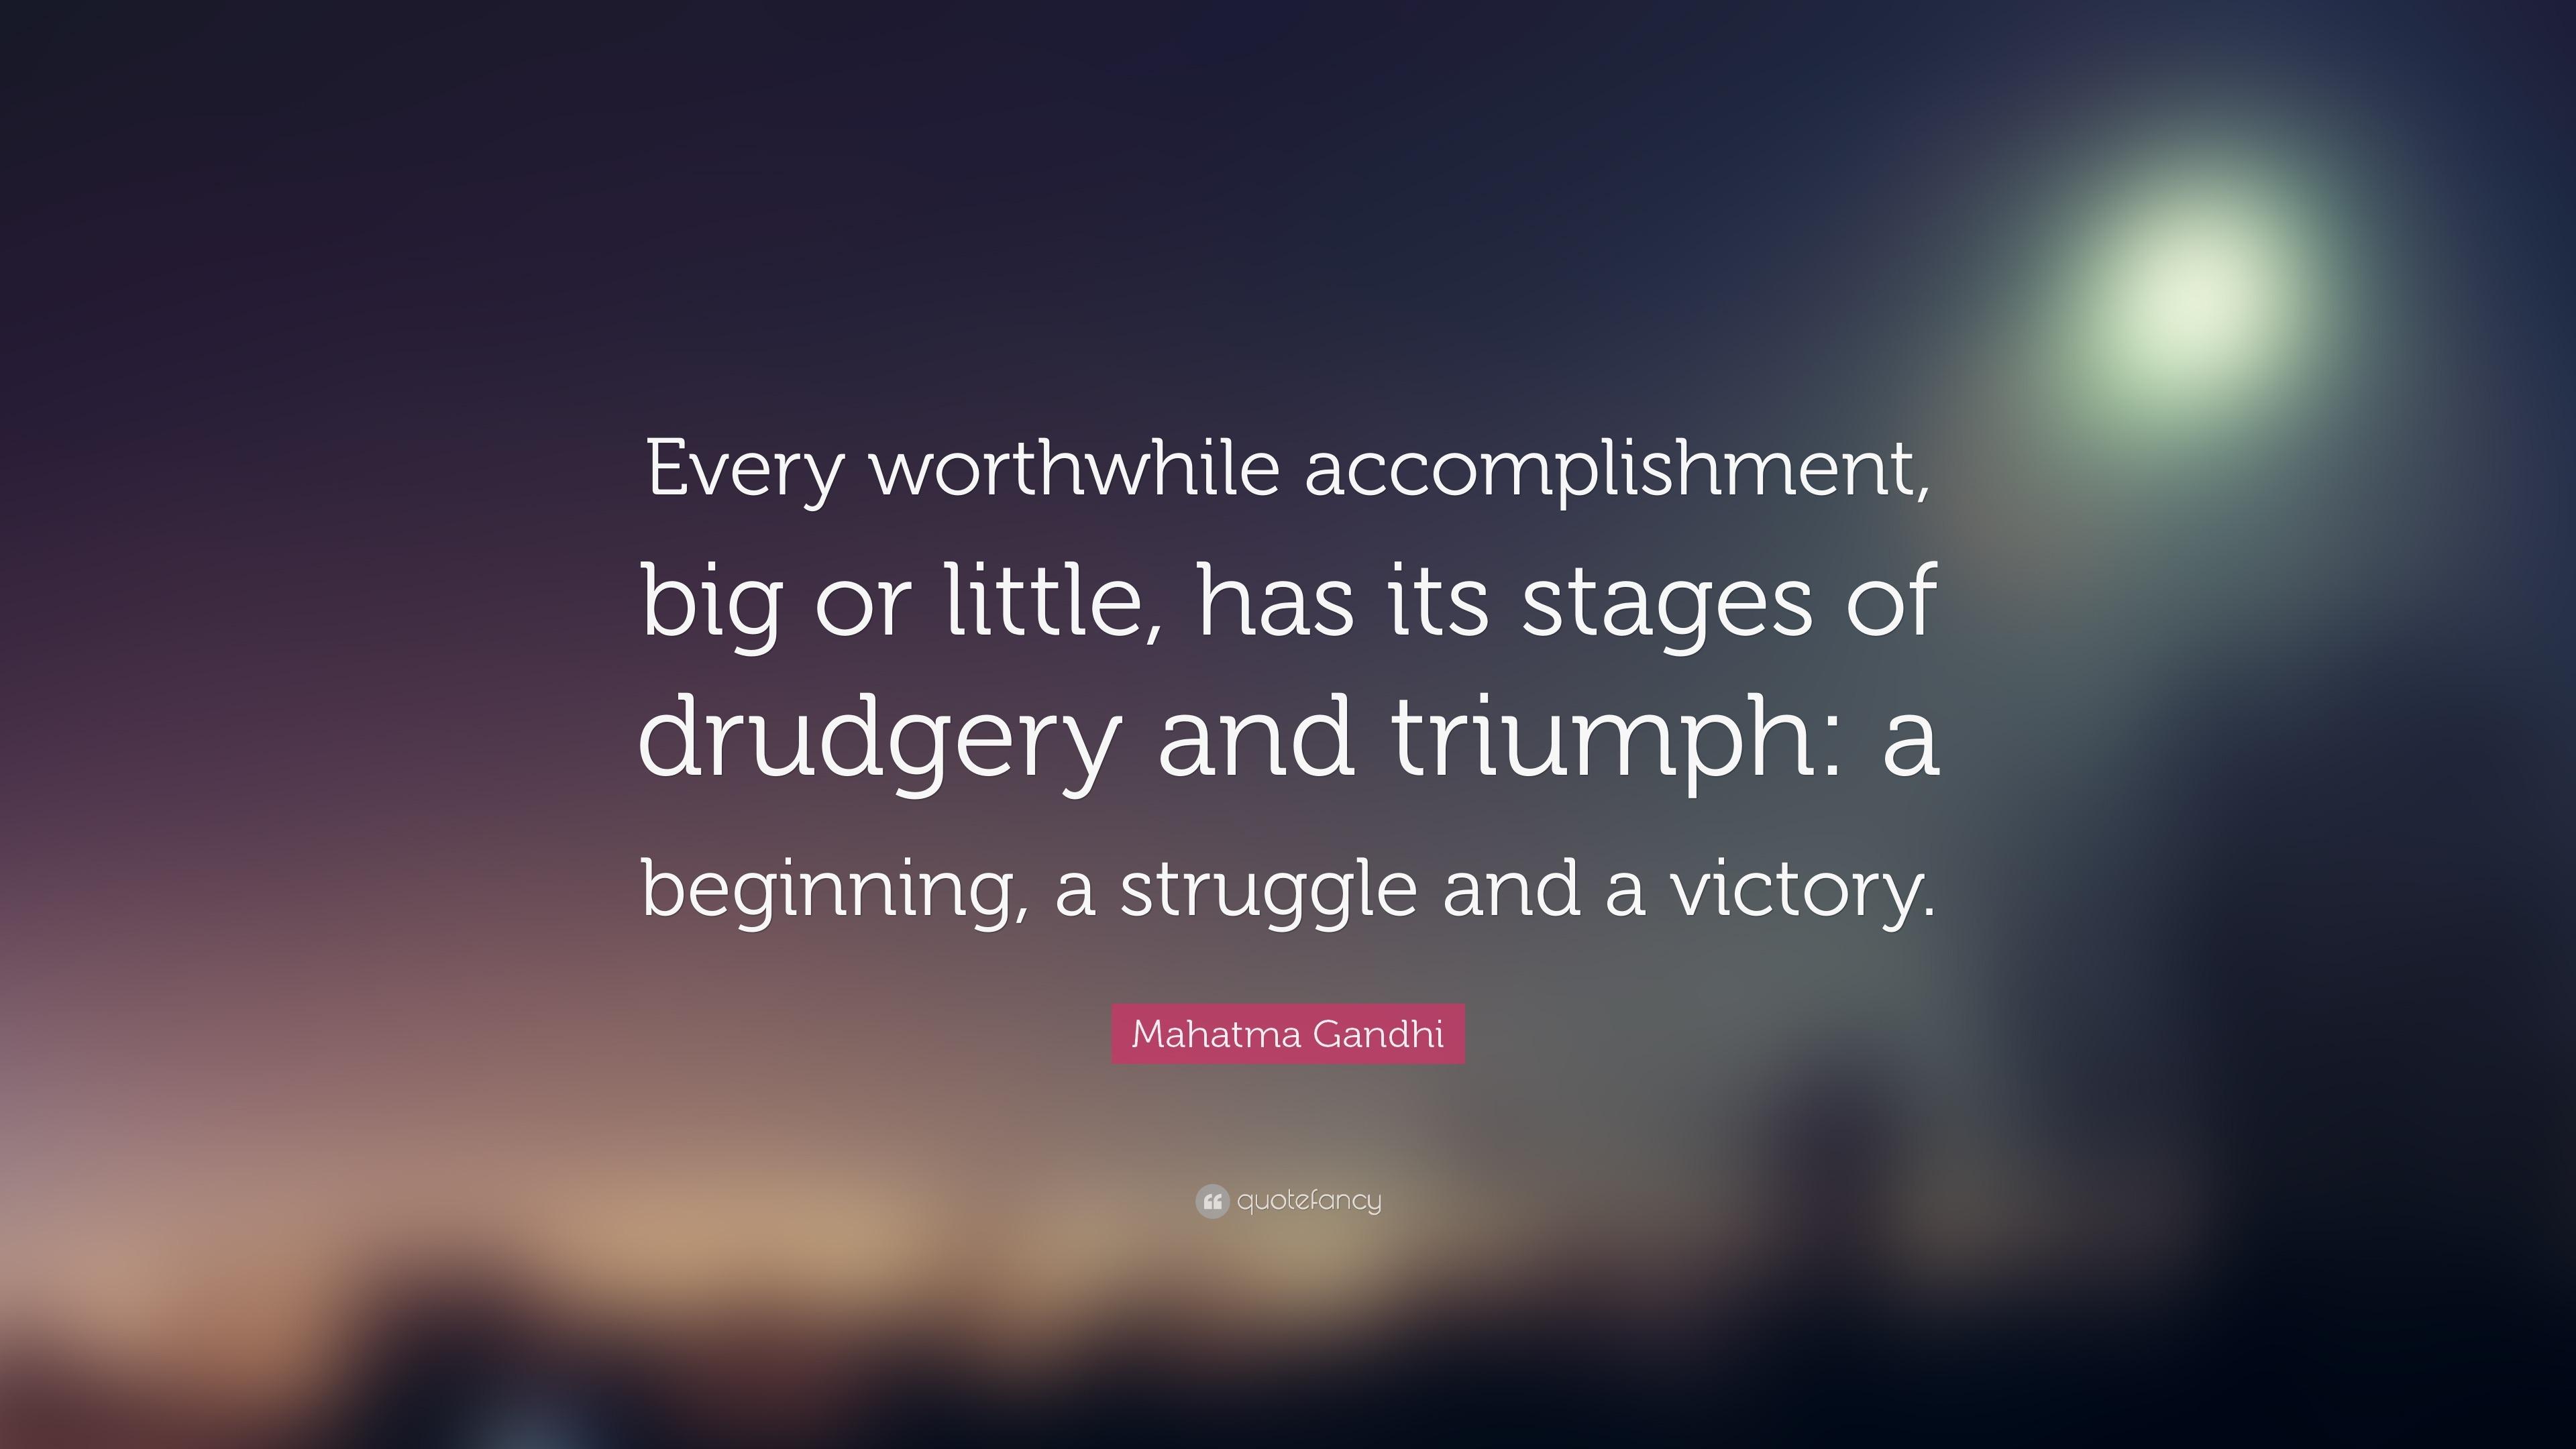 mahatma gandhi quote every worthwhile accomplishment big or mahatma gandhi quote every worthwhile accomplishment big or little has its stages